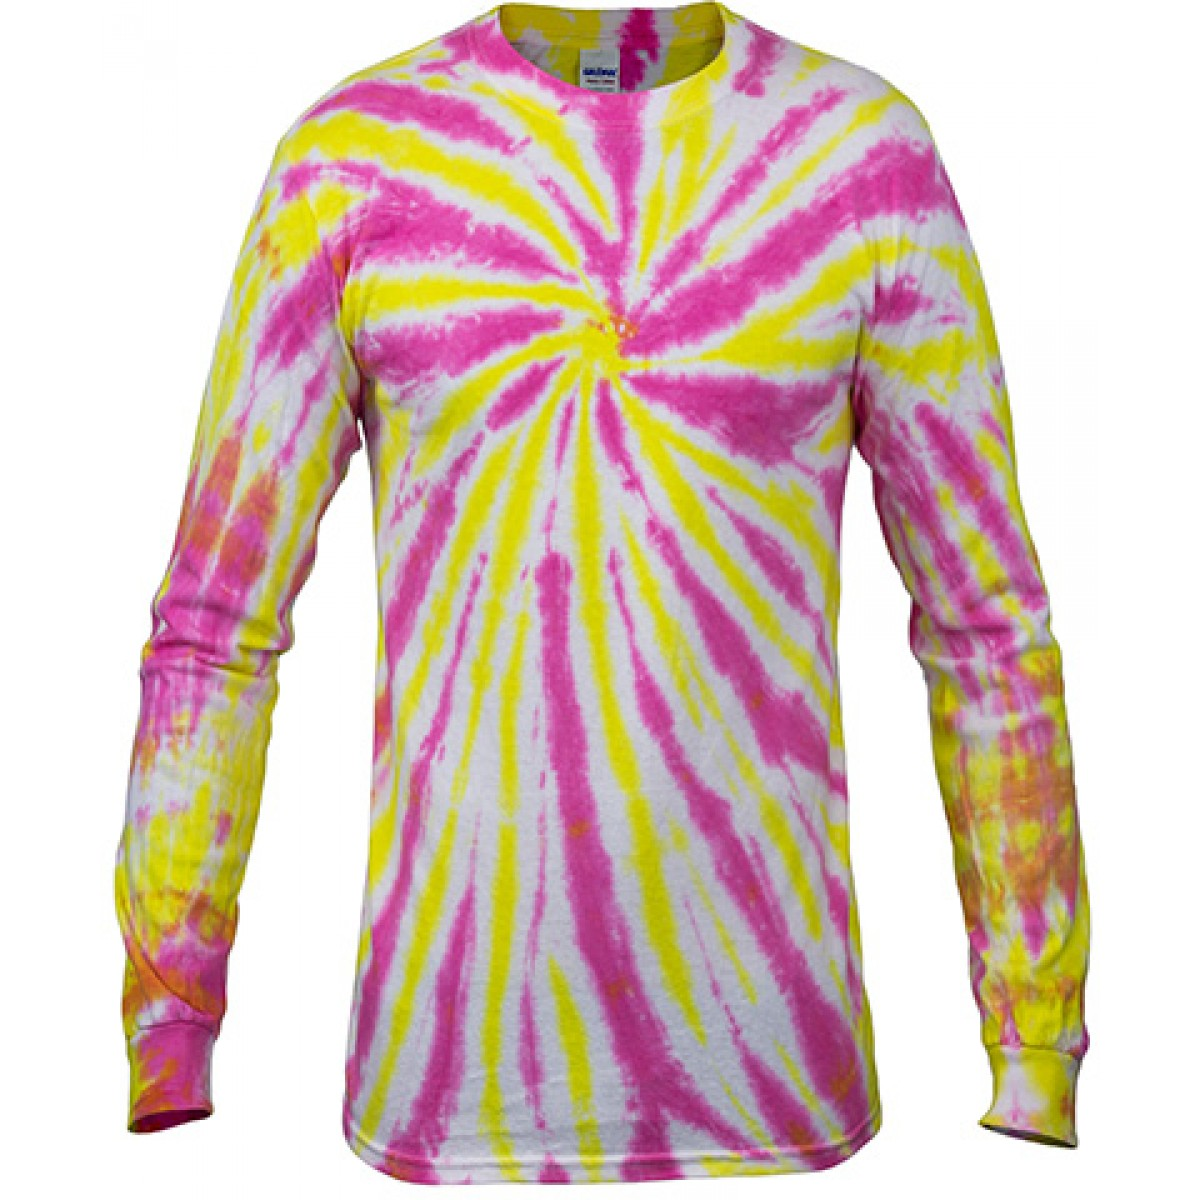 Multi Color Tie-Dye Long Sleeve Shirt -Pink-YL